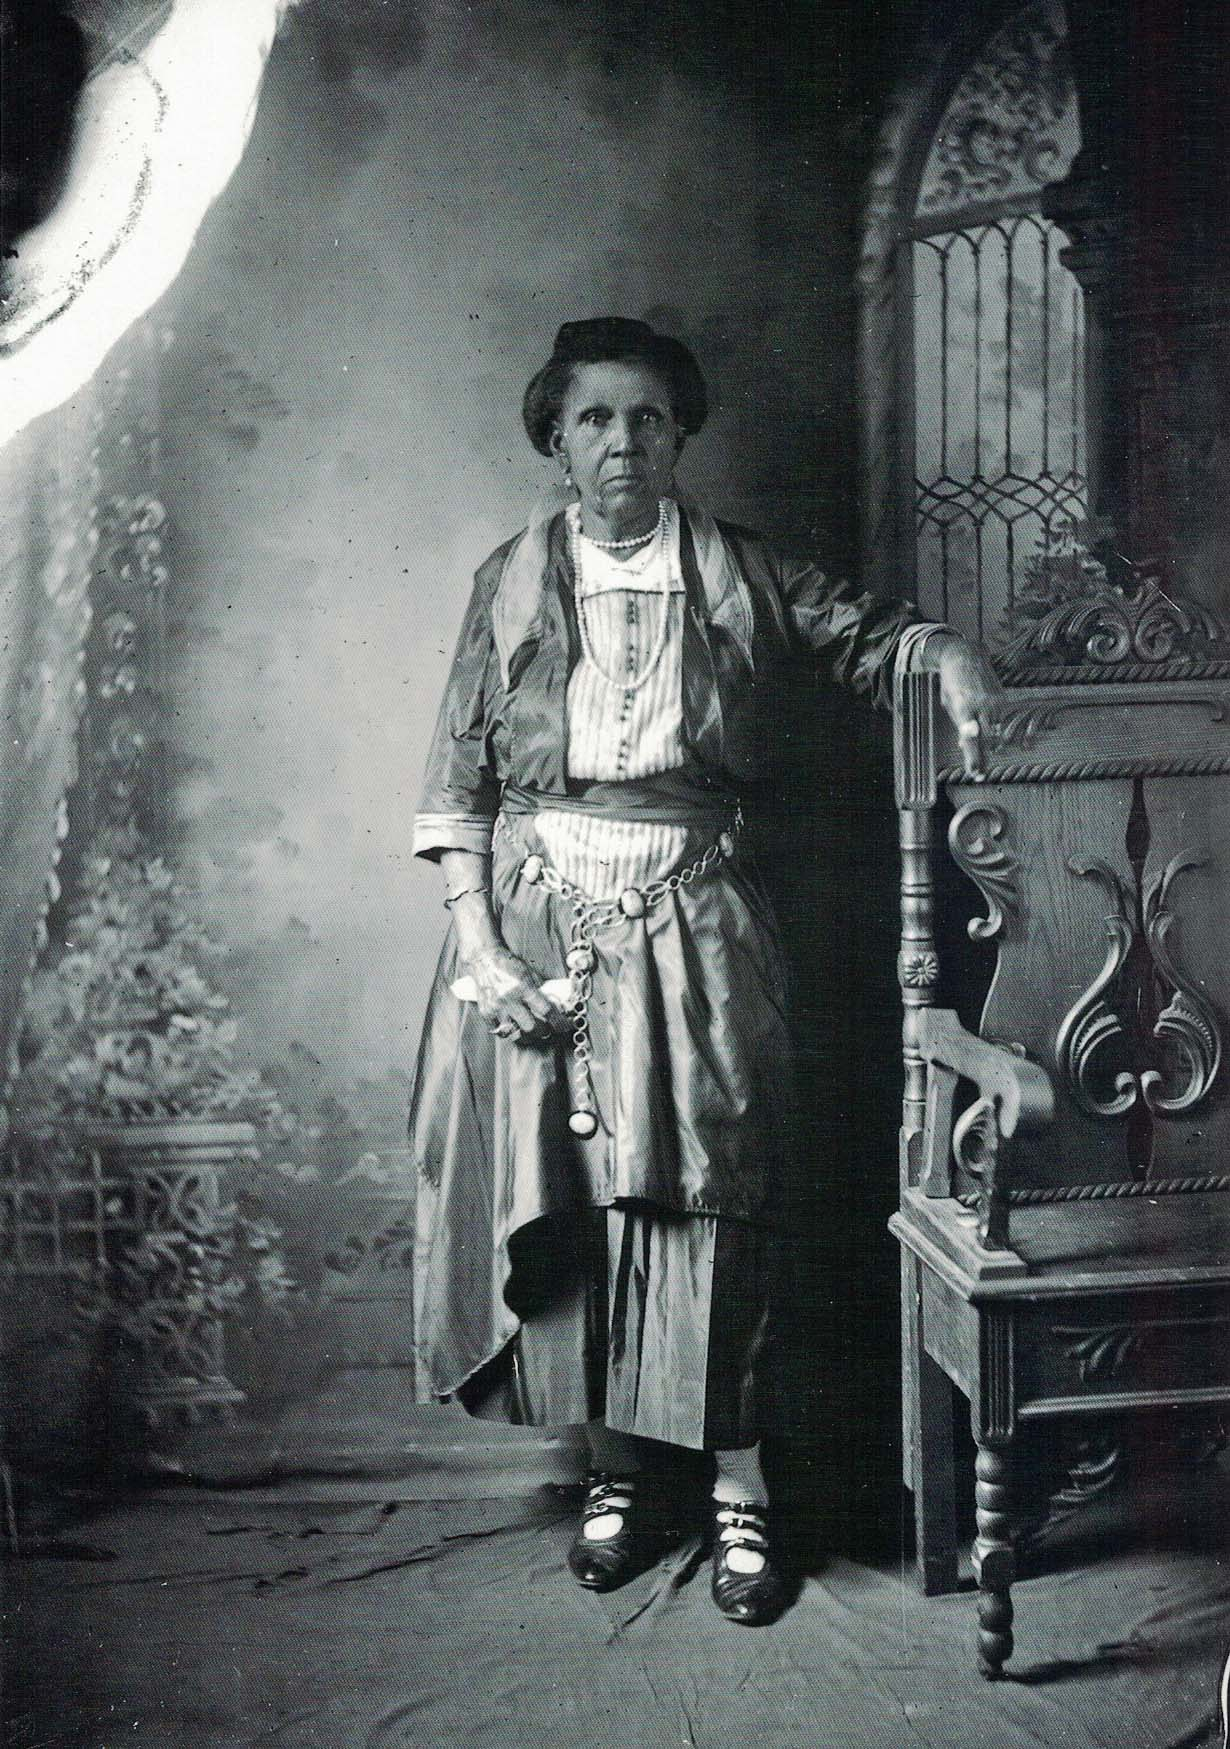 Unidentified woman in Roberts' studio, 1920s